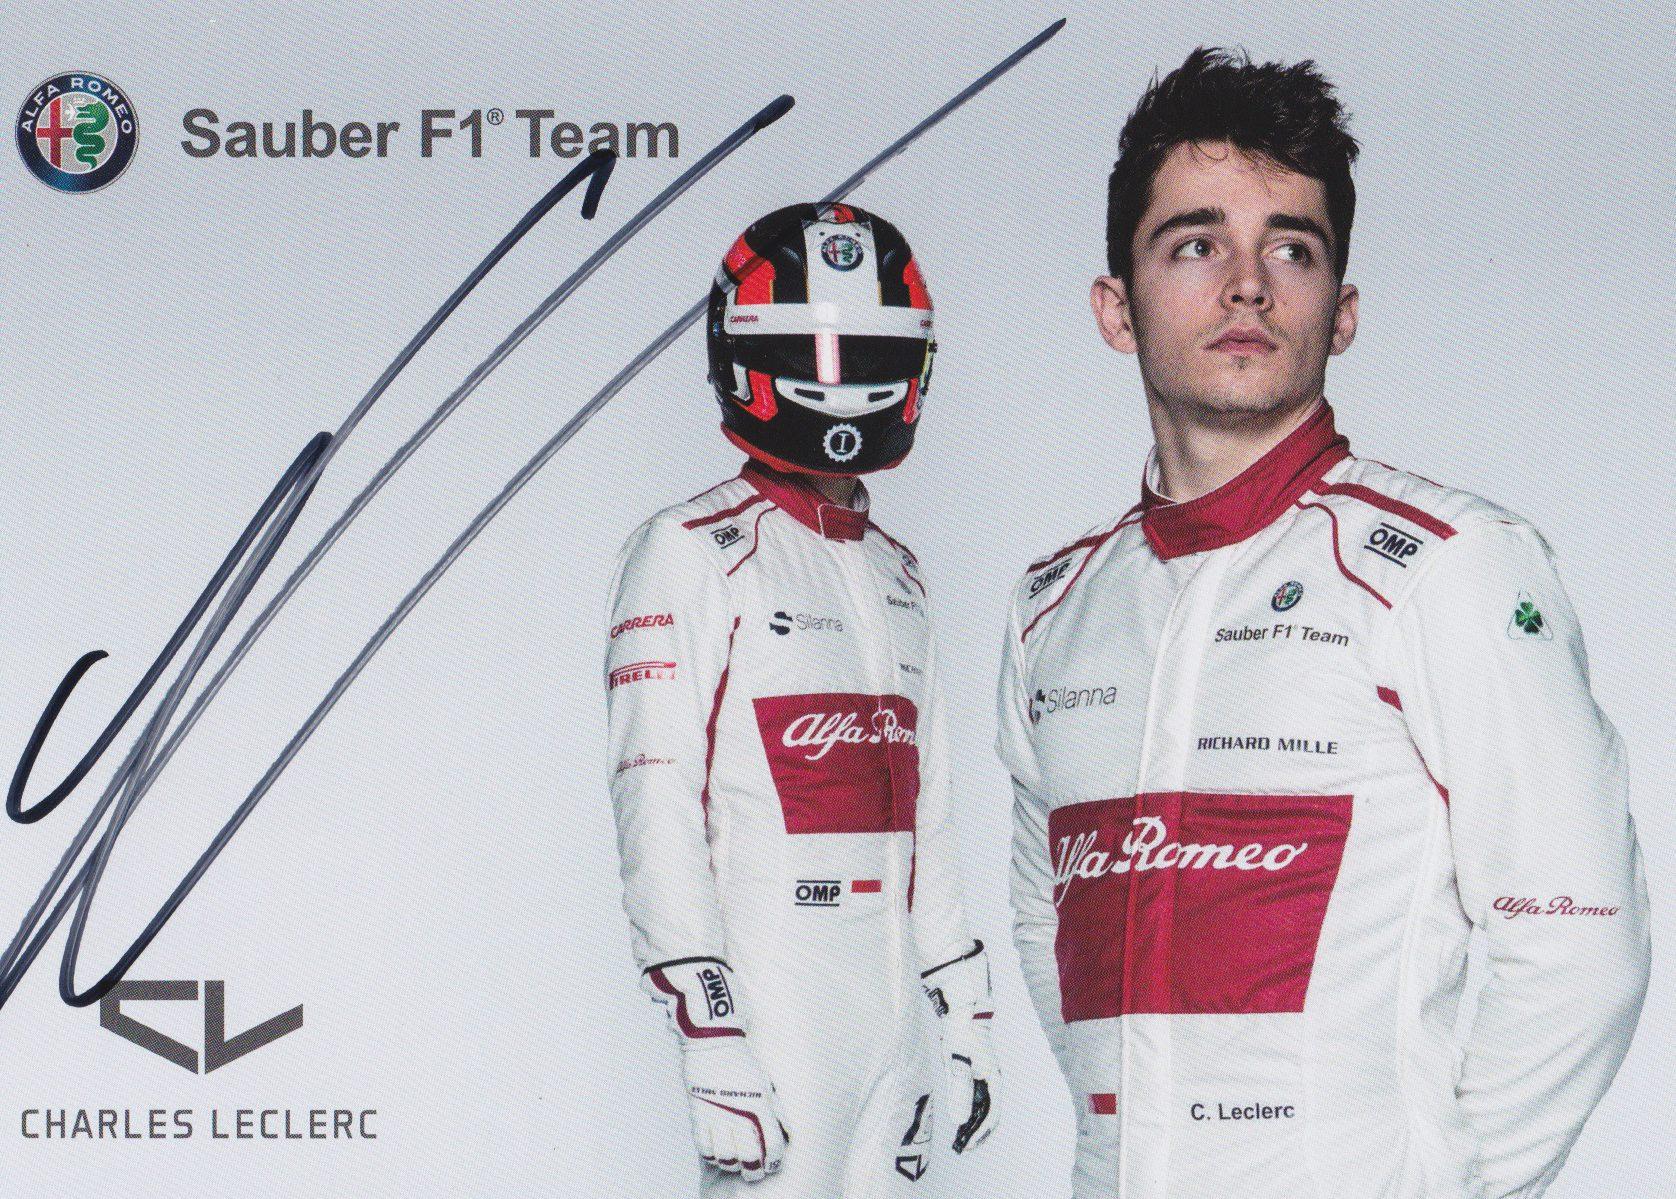 Charles Leclerc Sauber 2018 Card